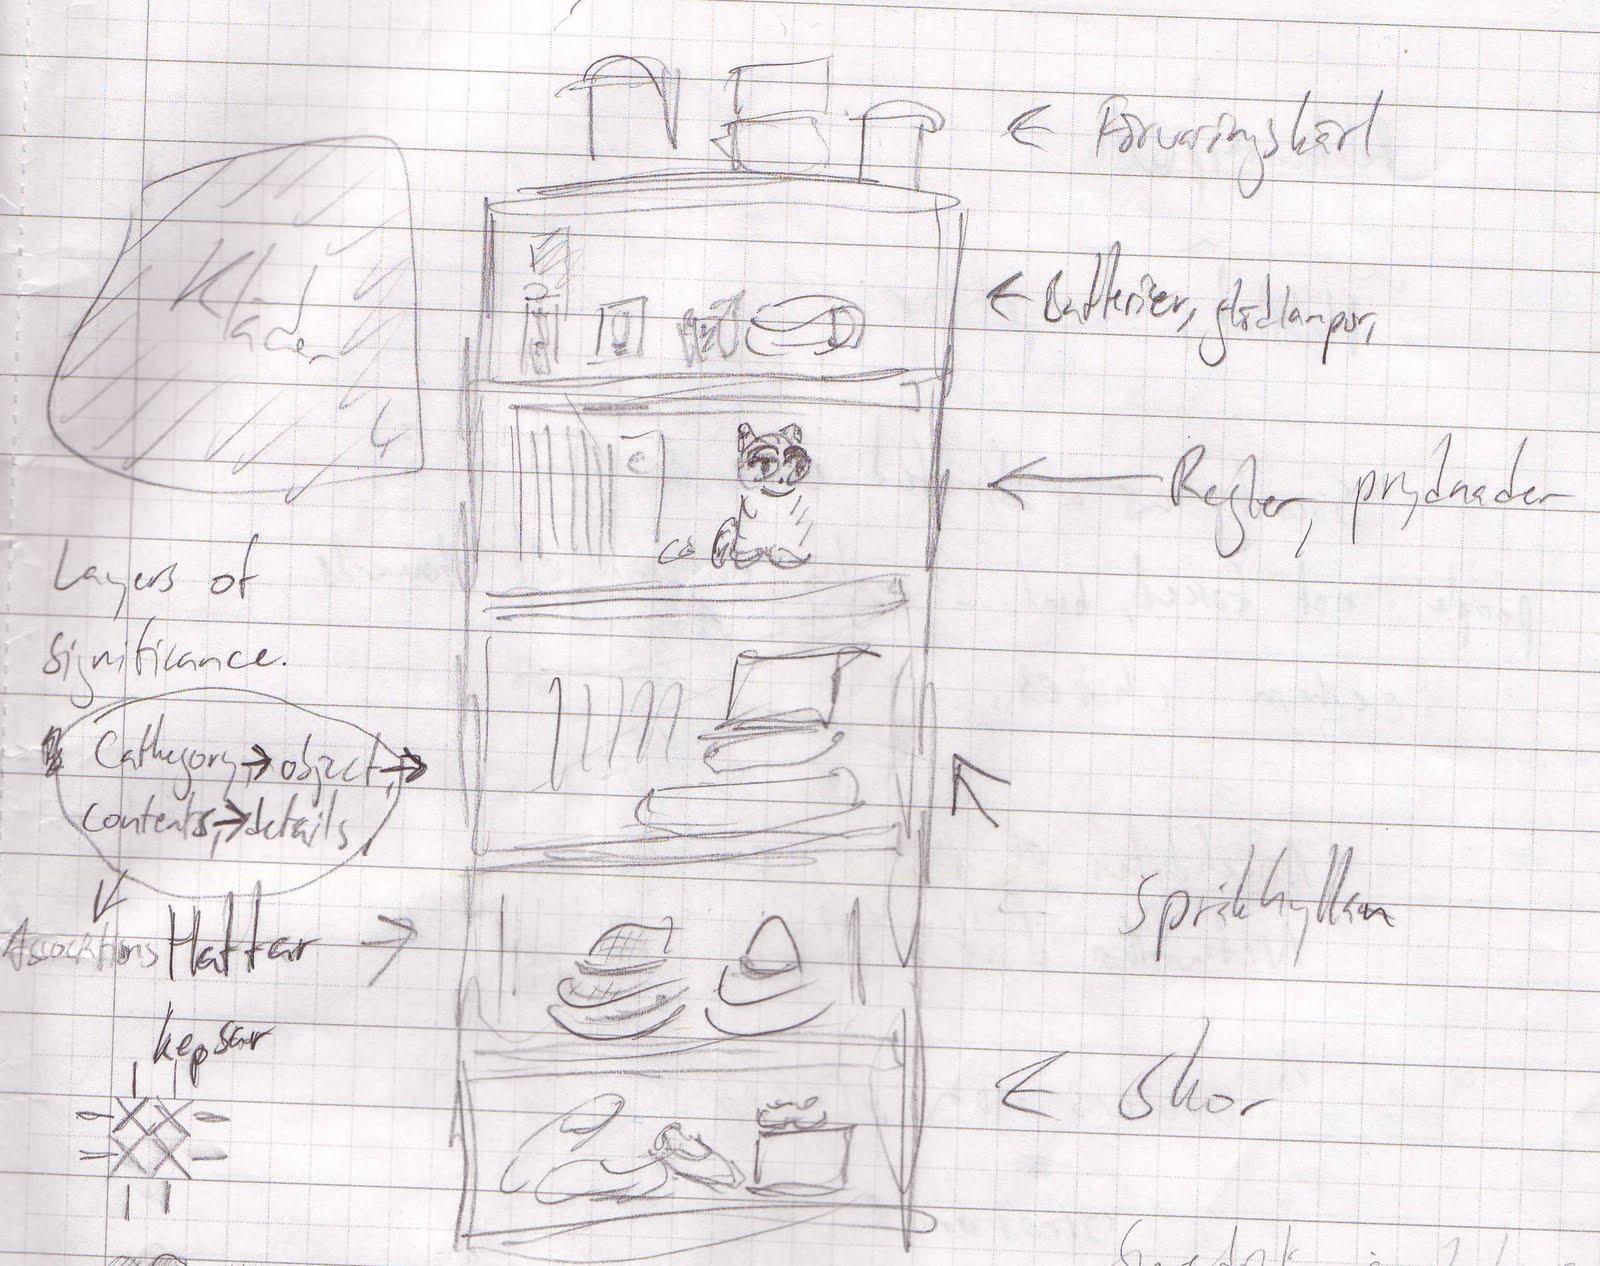 Pers Bookshelf A Sketch